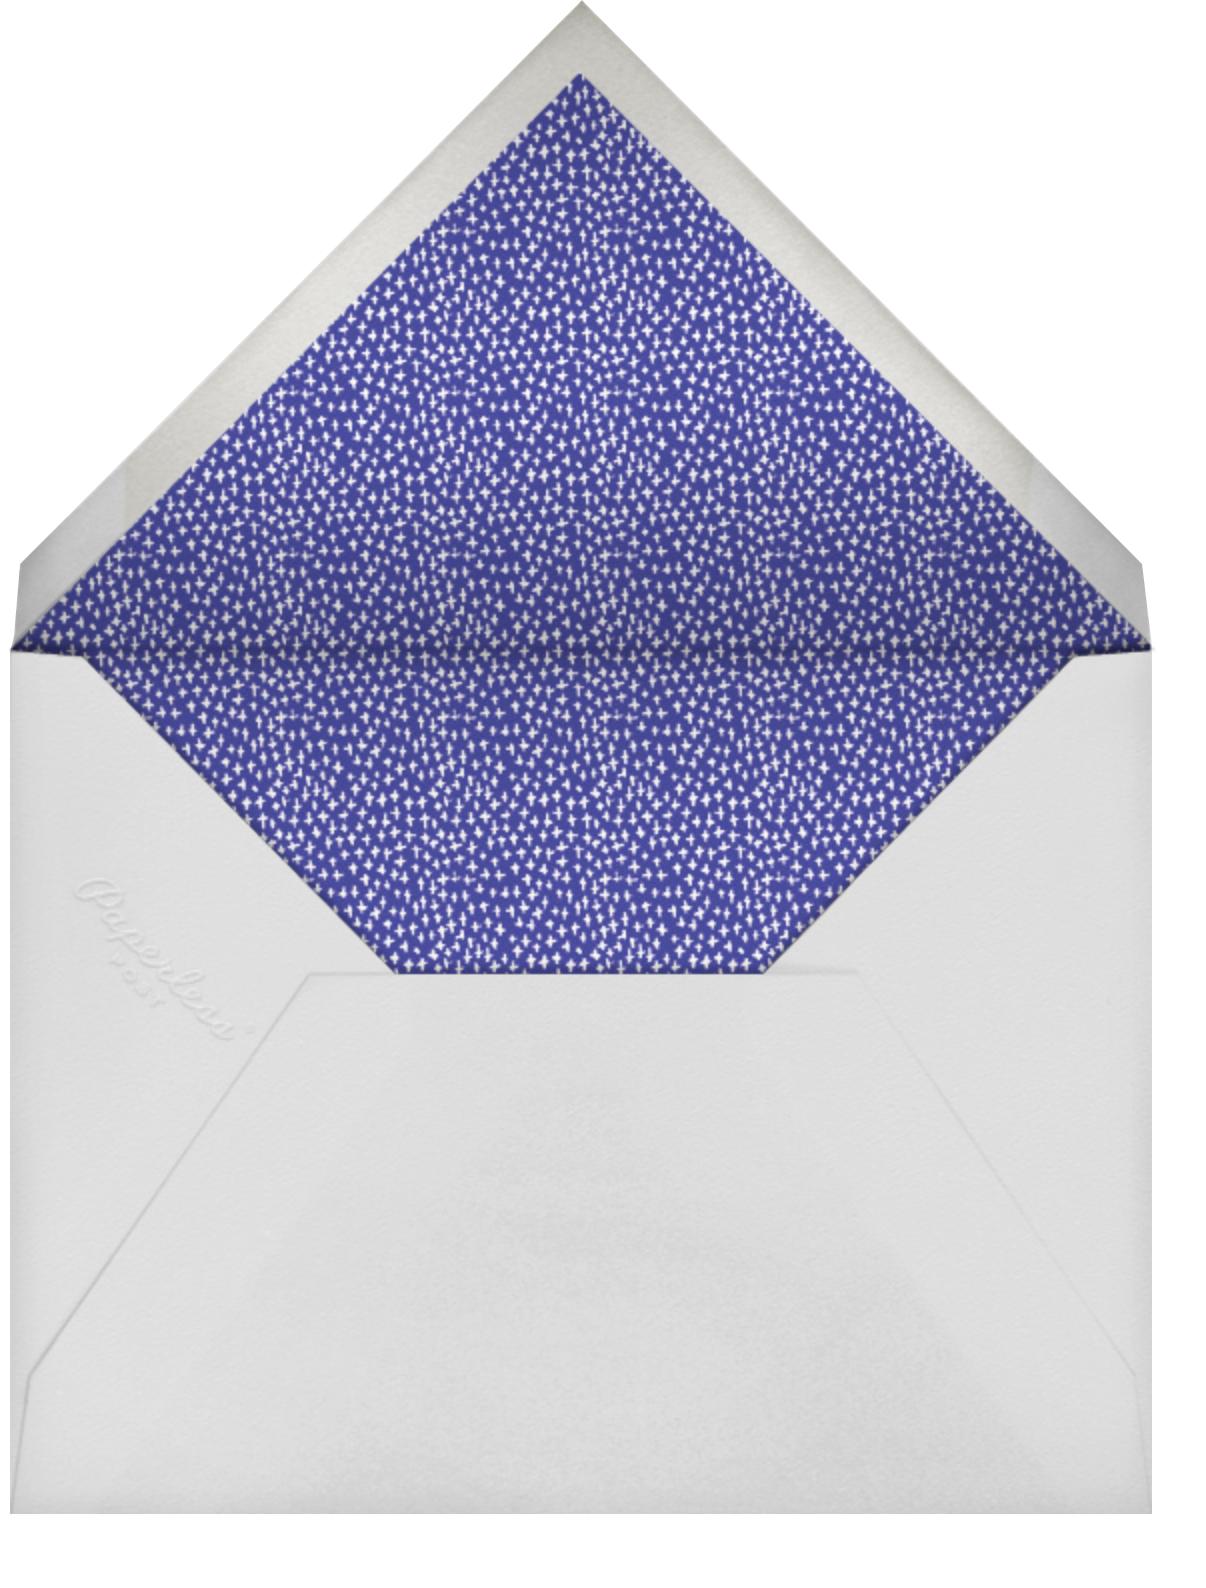 Ready to Burst - Bellini/Light - Mr. Boddington's Studio - Envelope